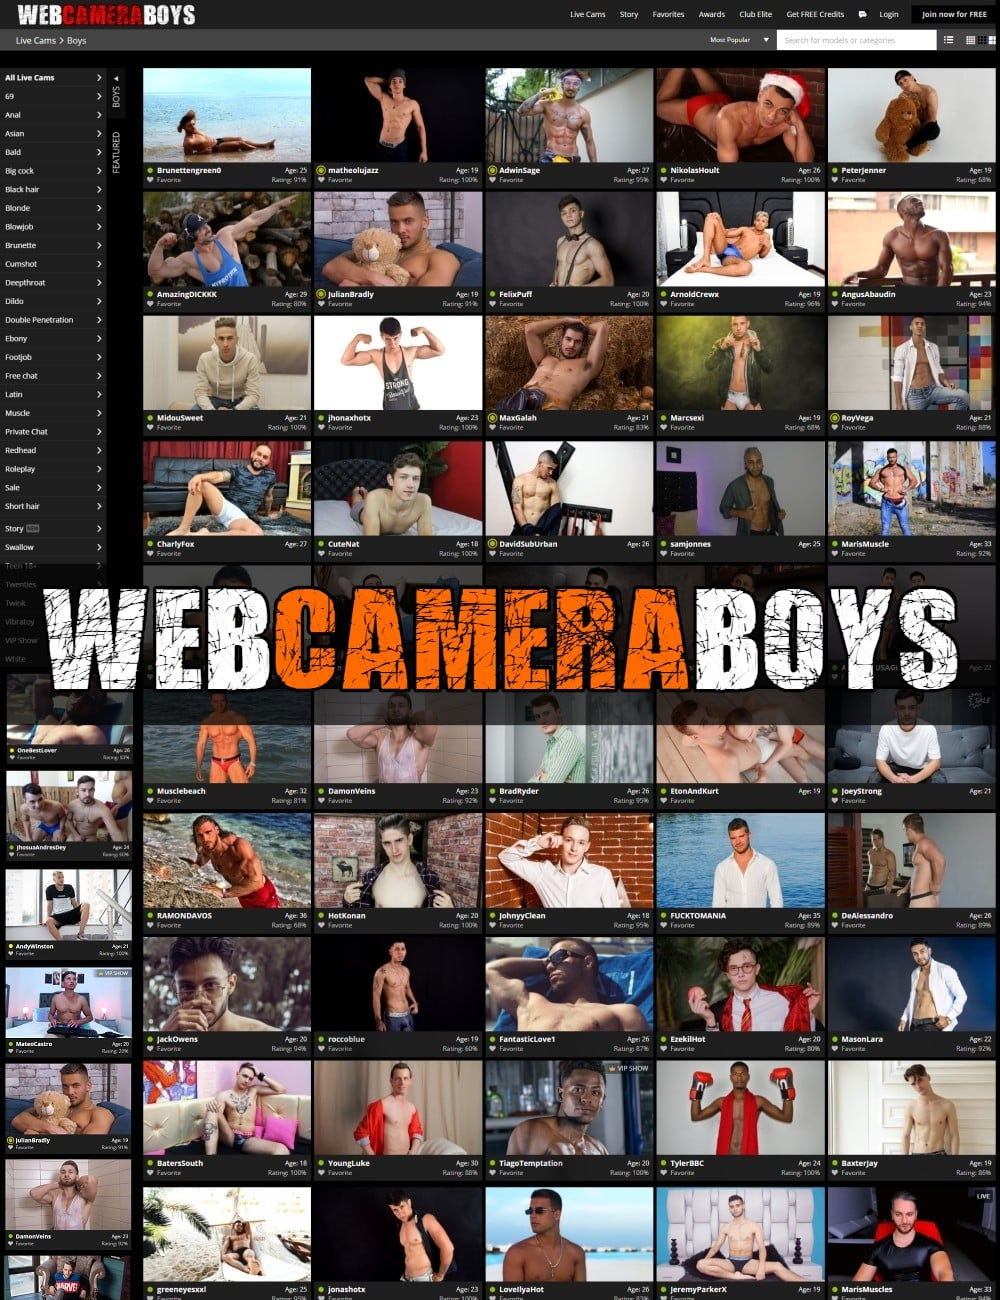 Web Camera Boys